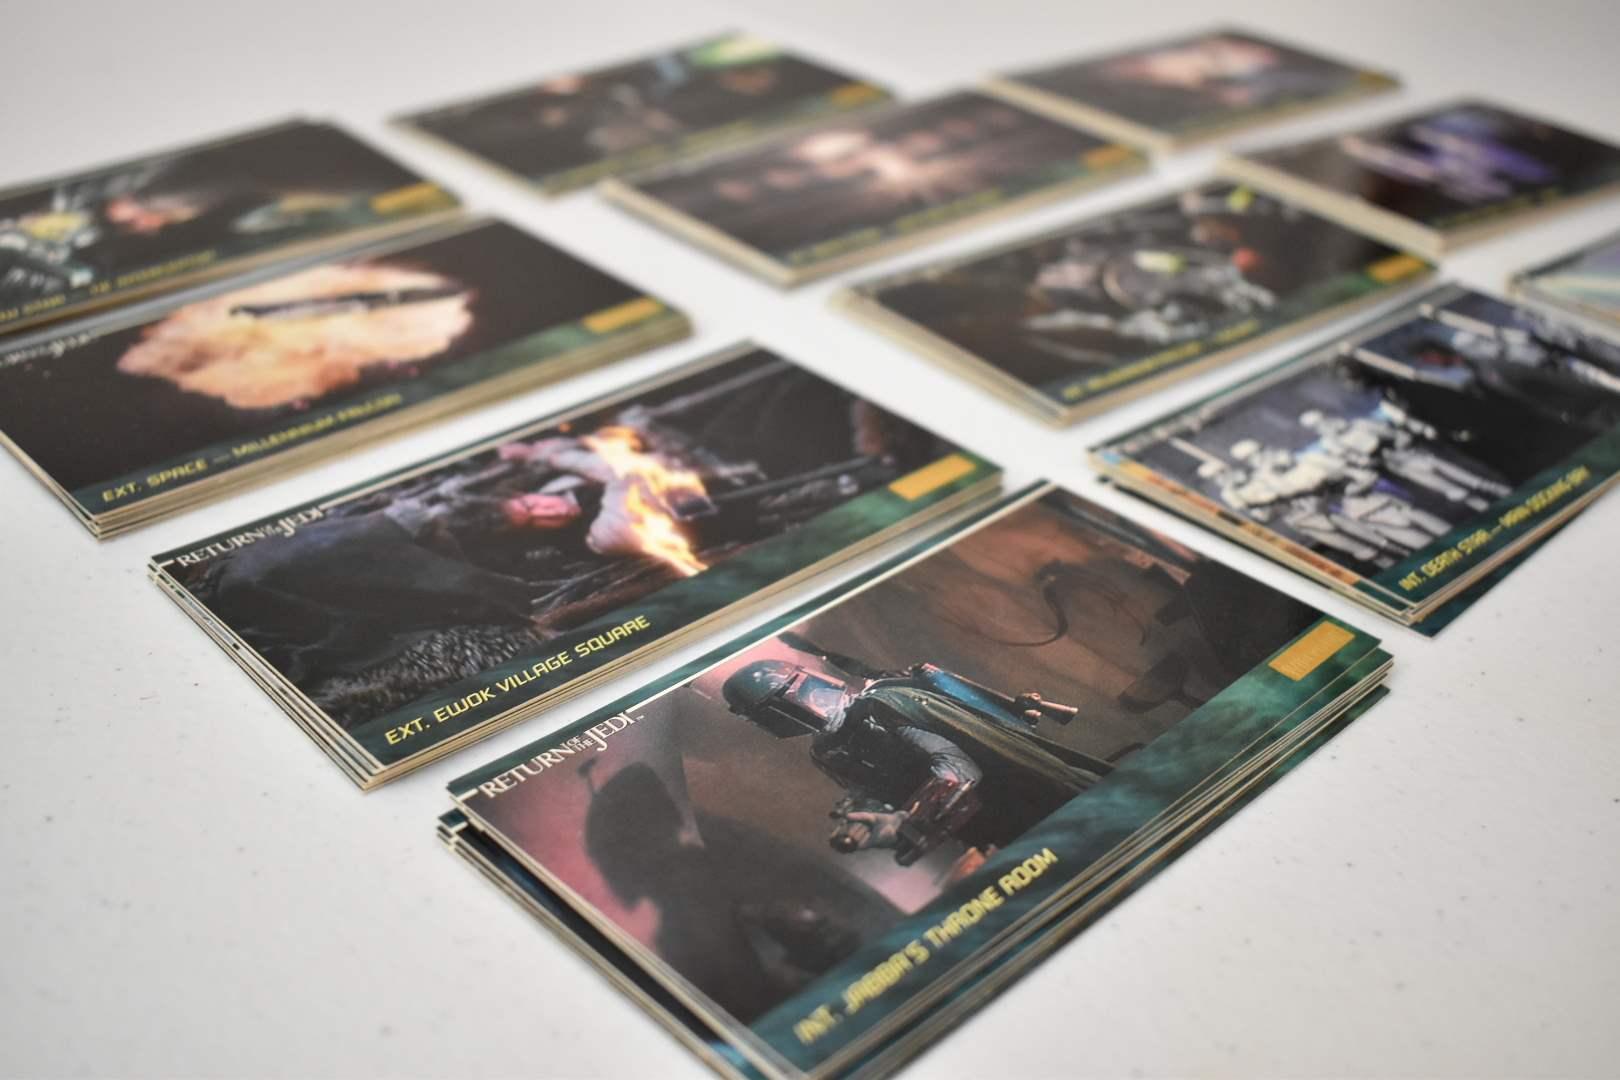 Vintage STAR WARS Return of the Jedi Movie Cards (over 100)